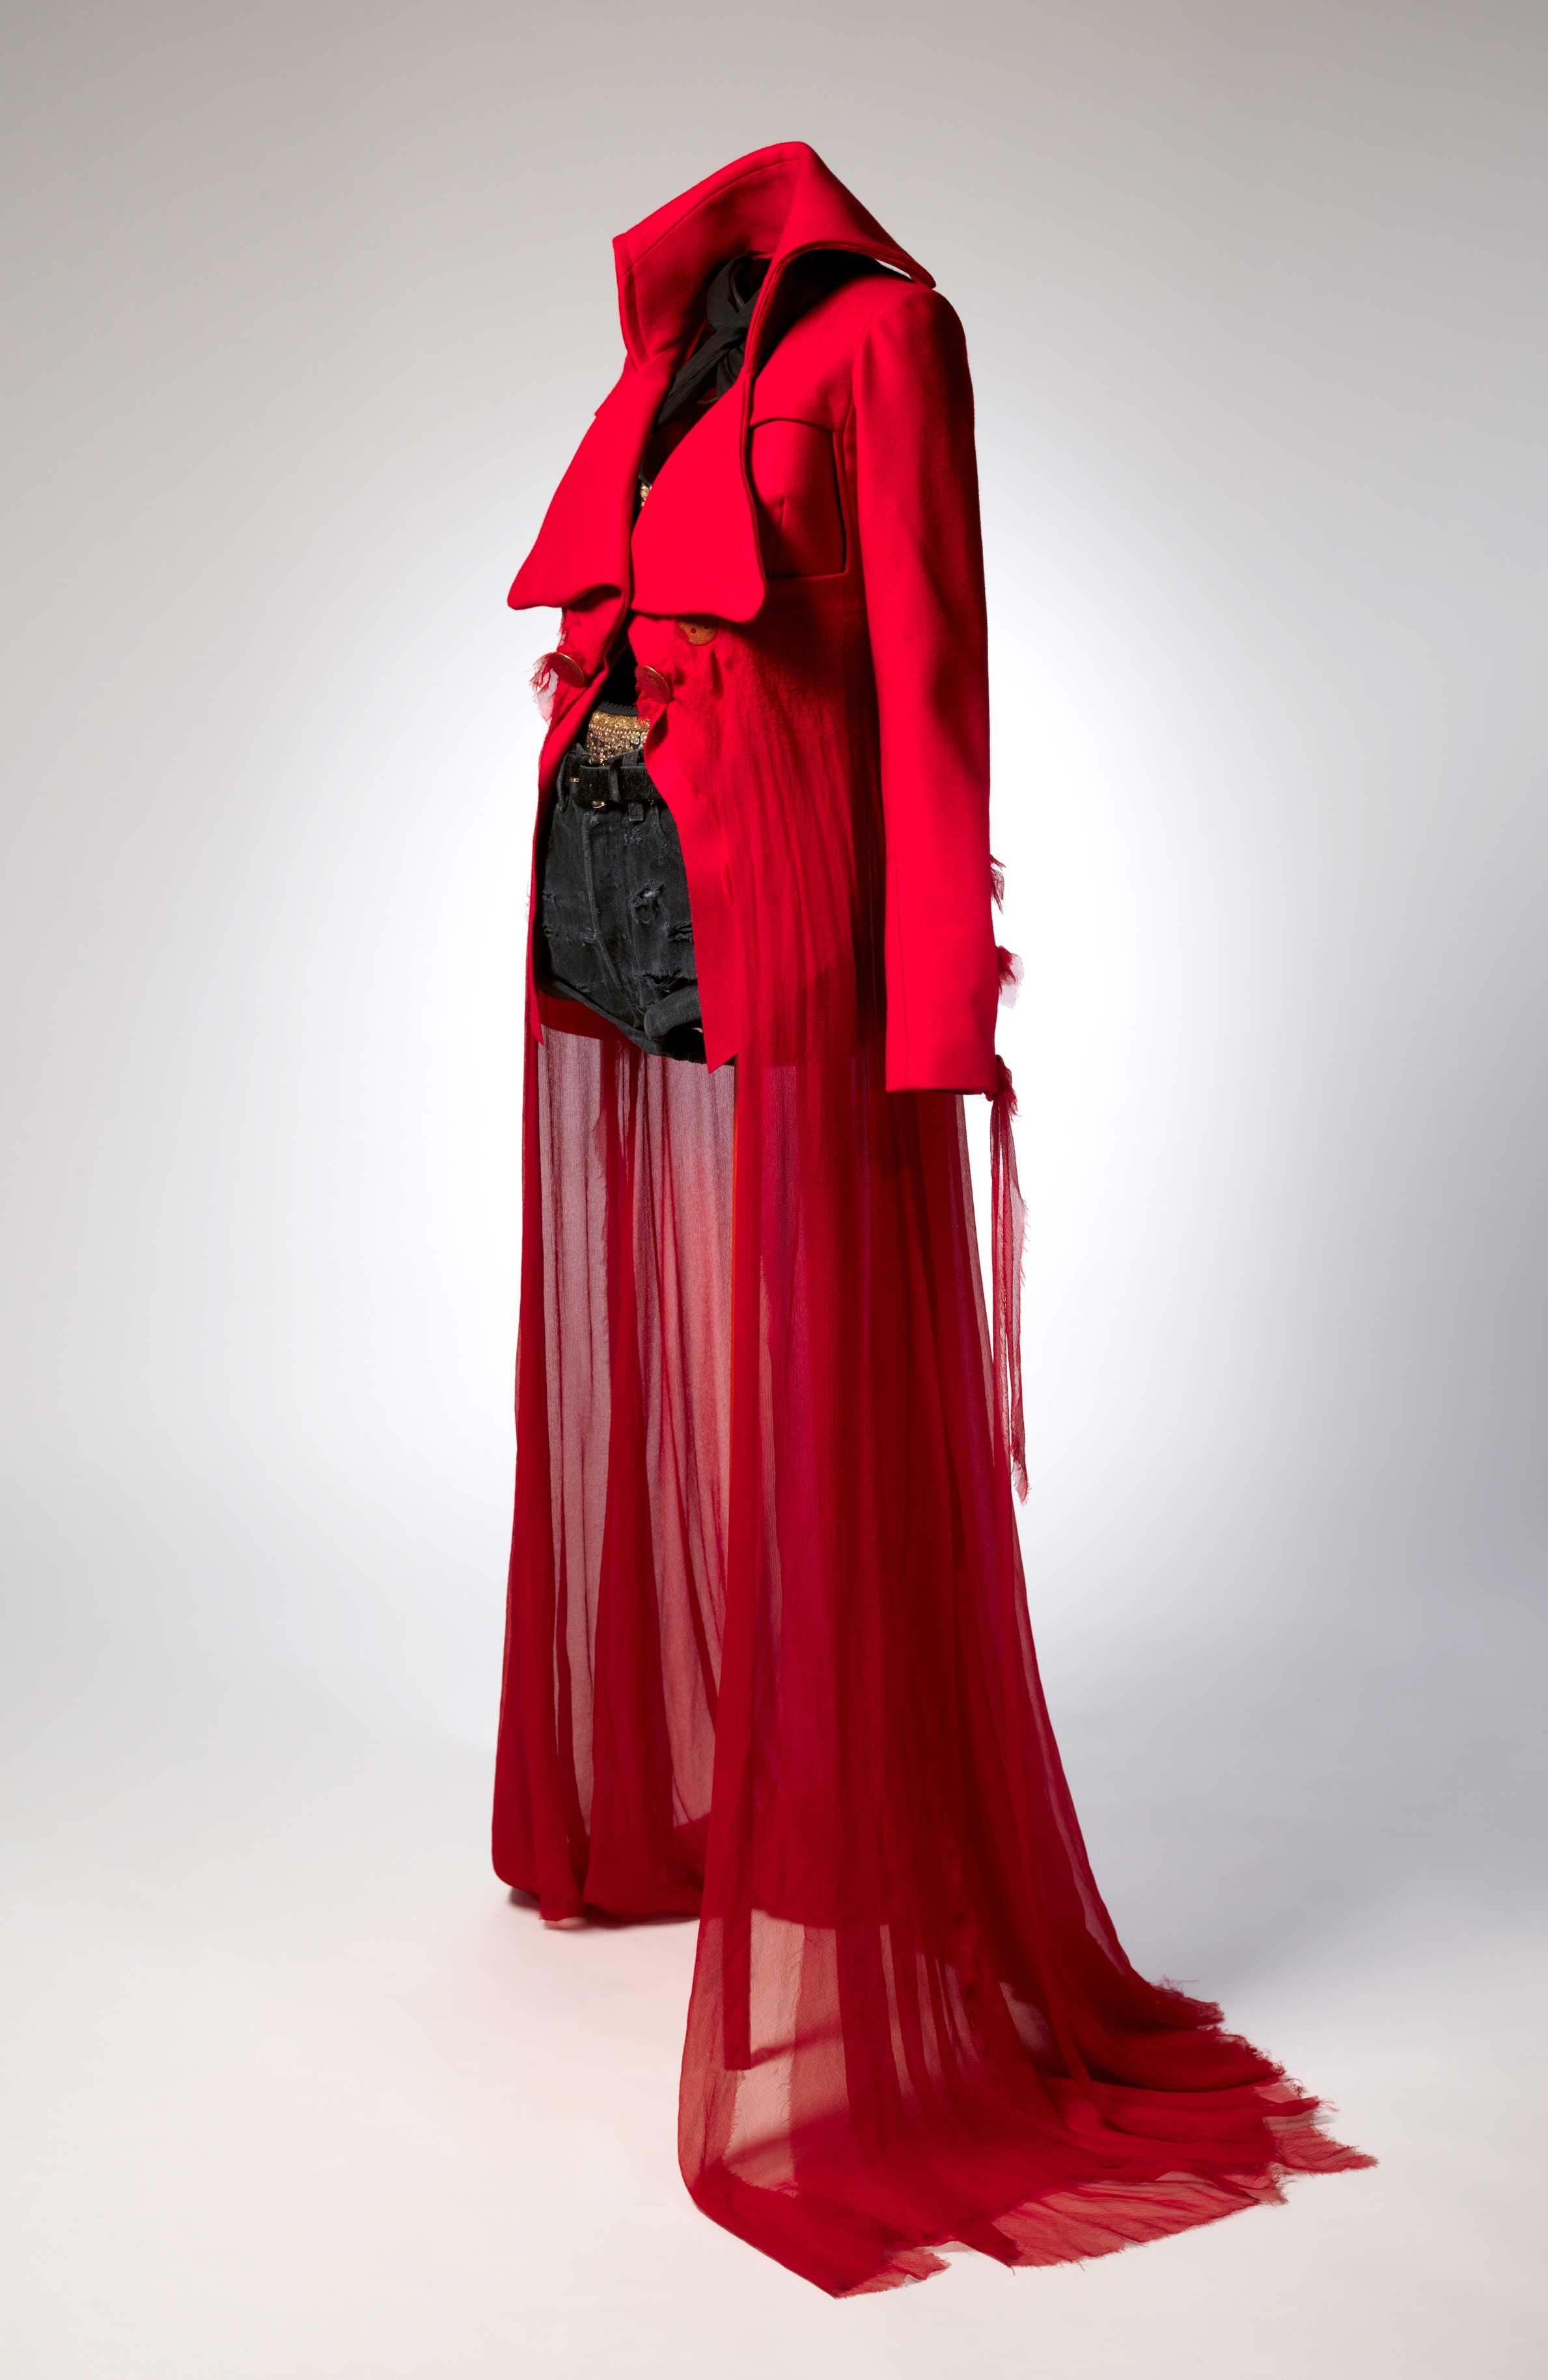 Masterworks: Unpacking Fashion fashion feat. John Galliano for Maison Margiela